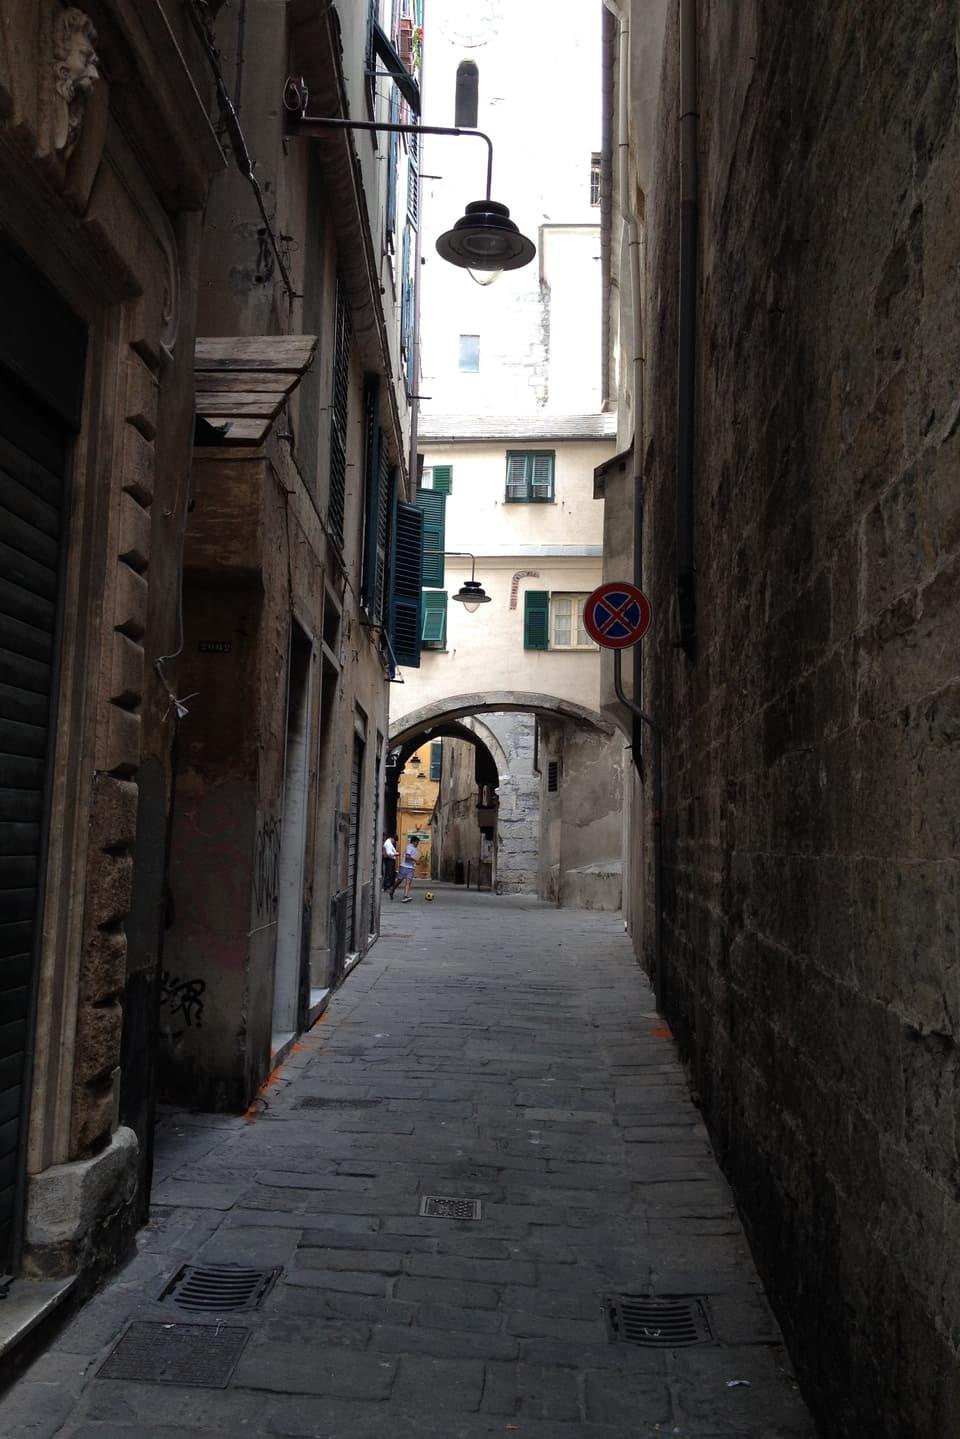 Ina giassa da la citad veglia da Genova.